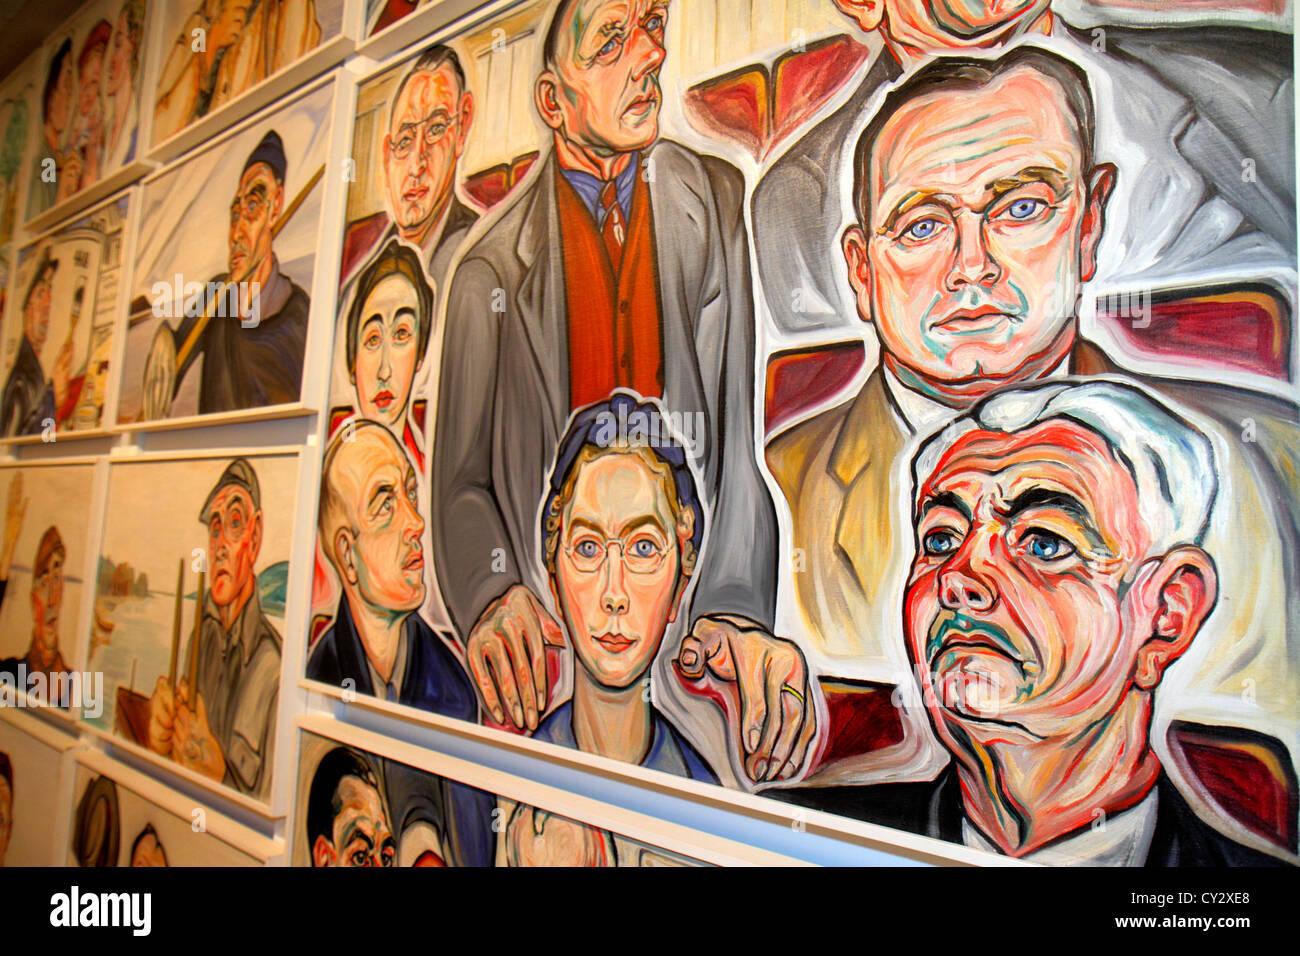 Pintura Mural Arte Historia